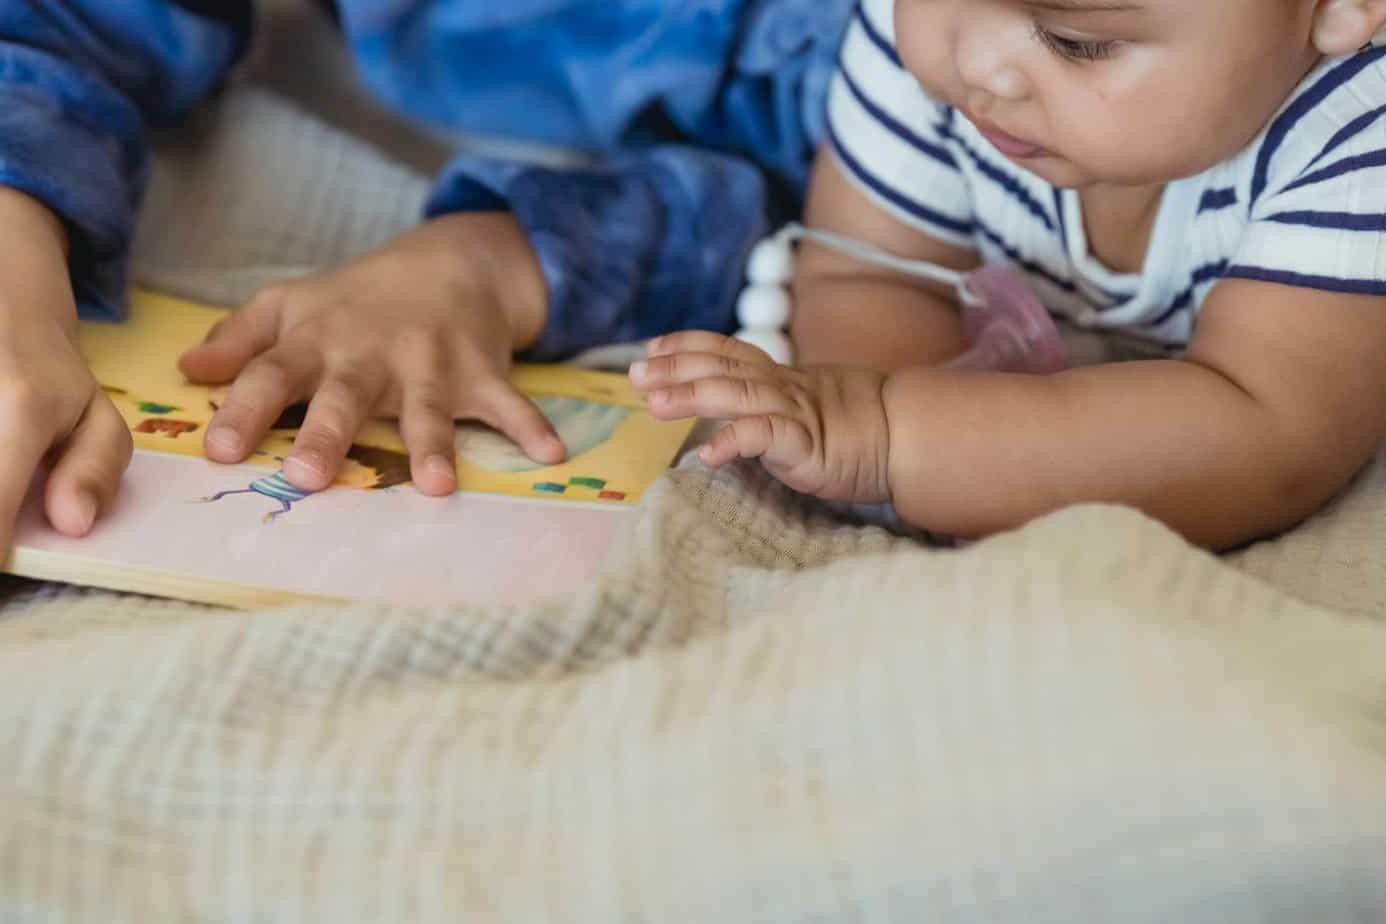 modify child custody